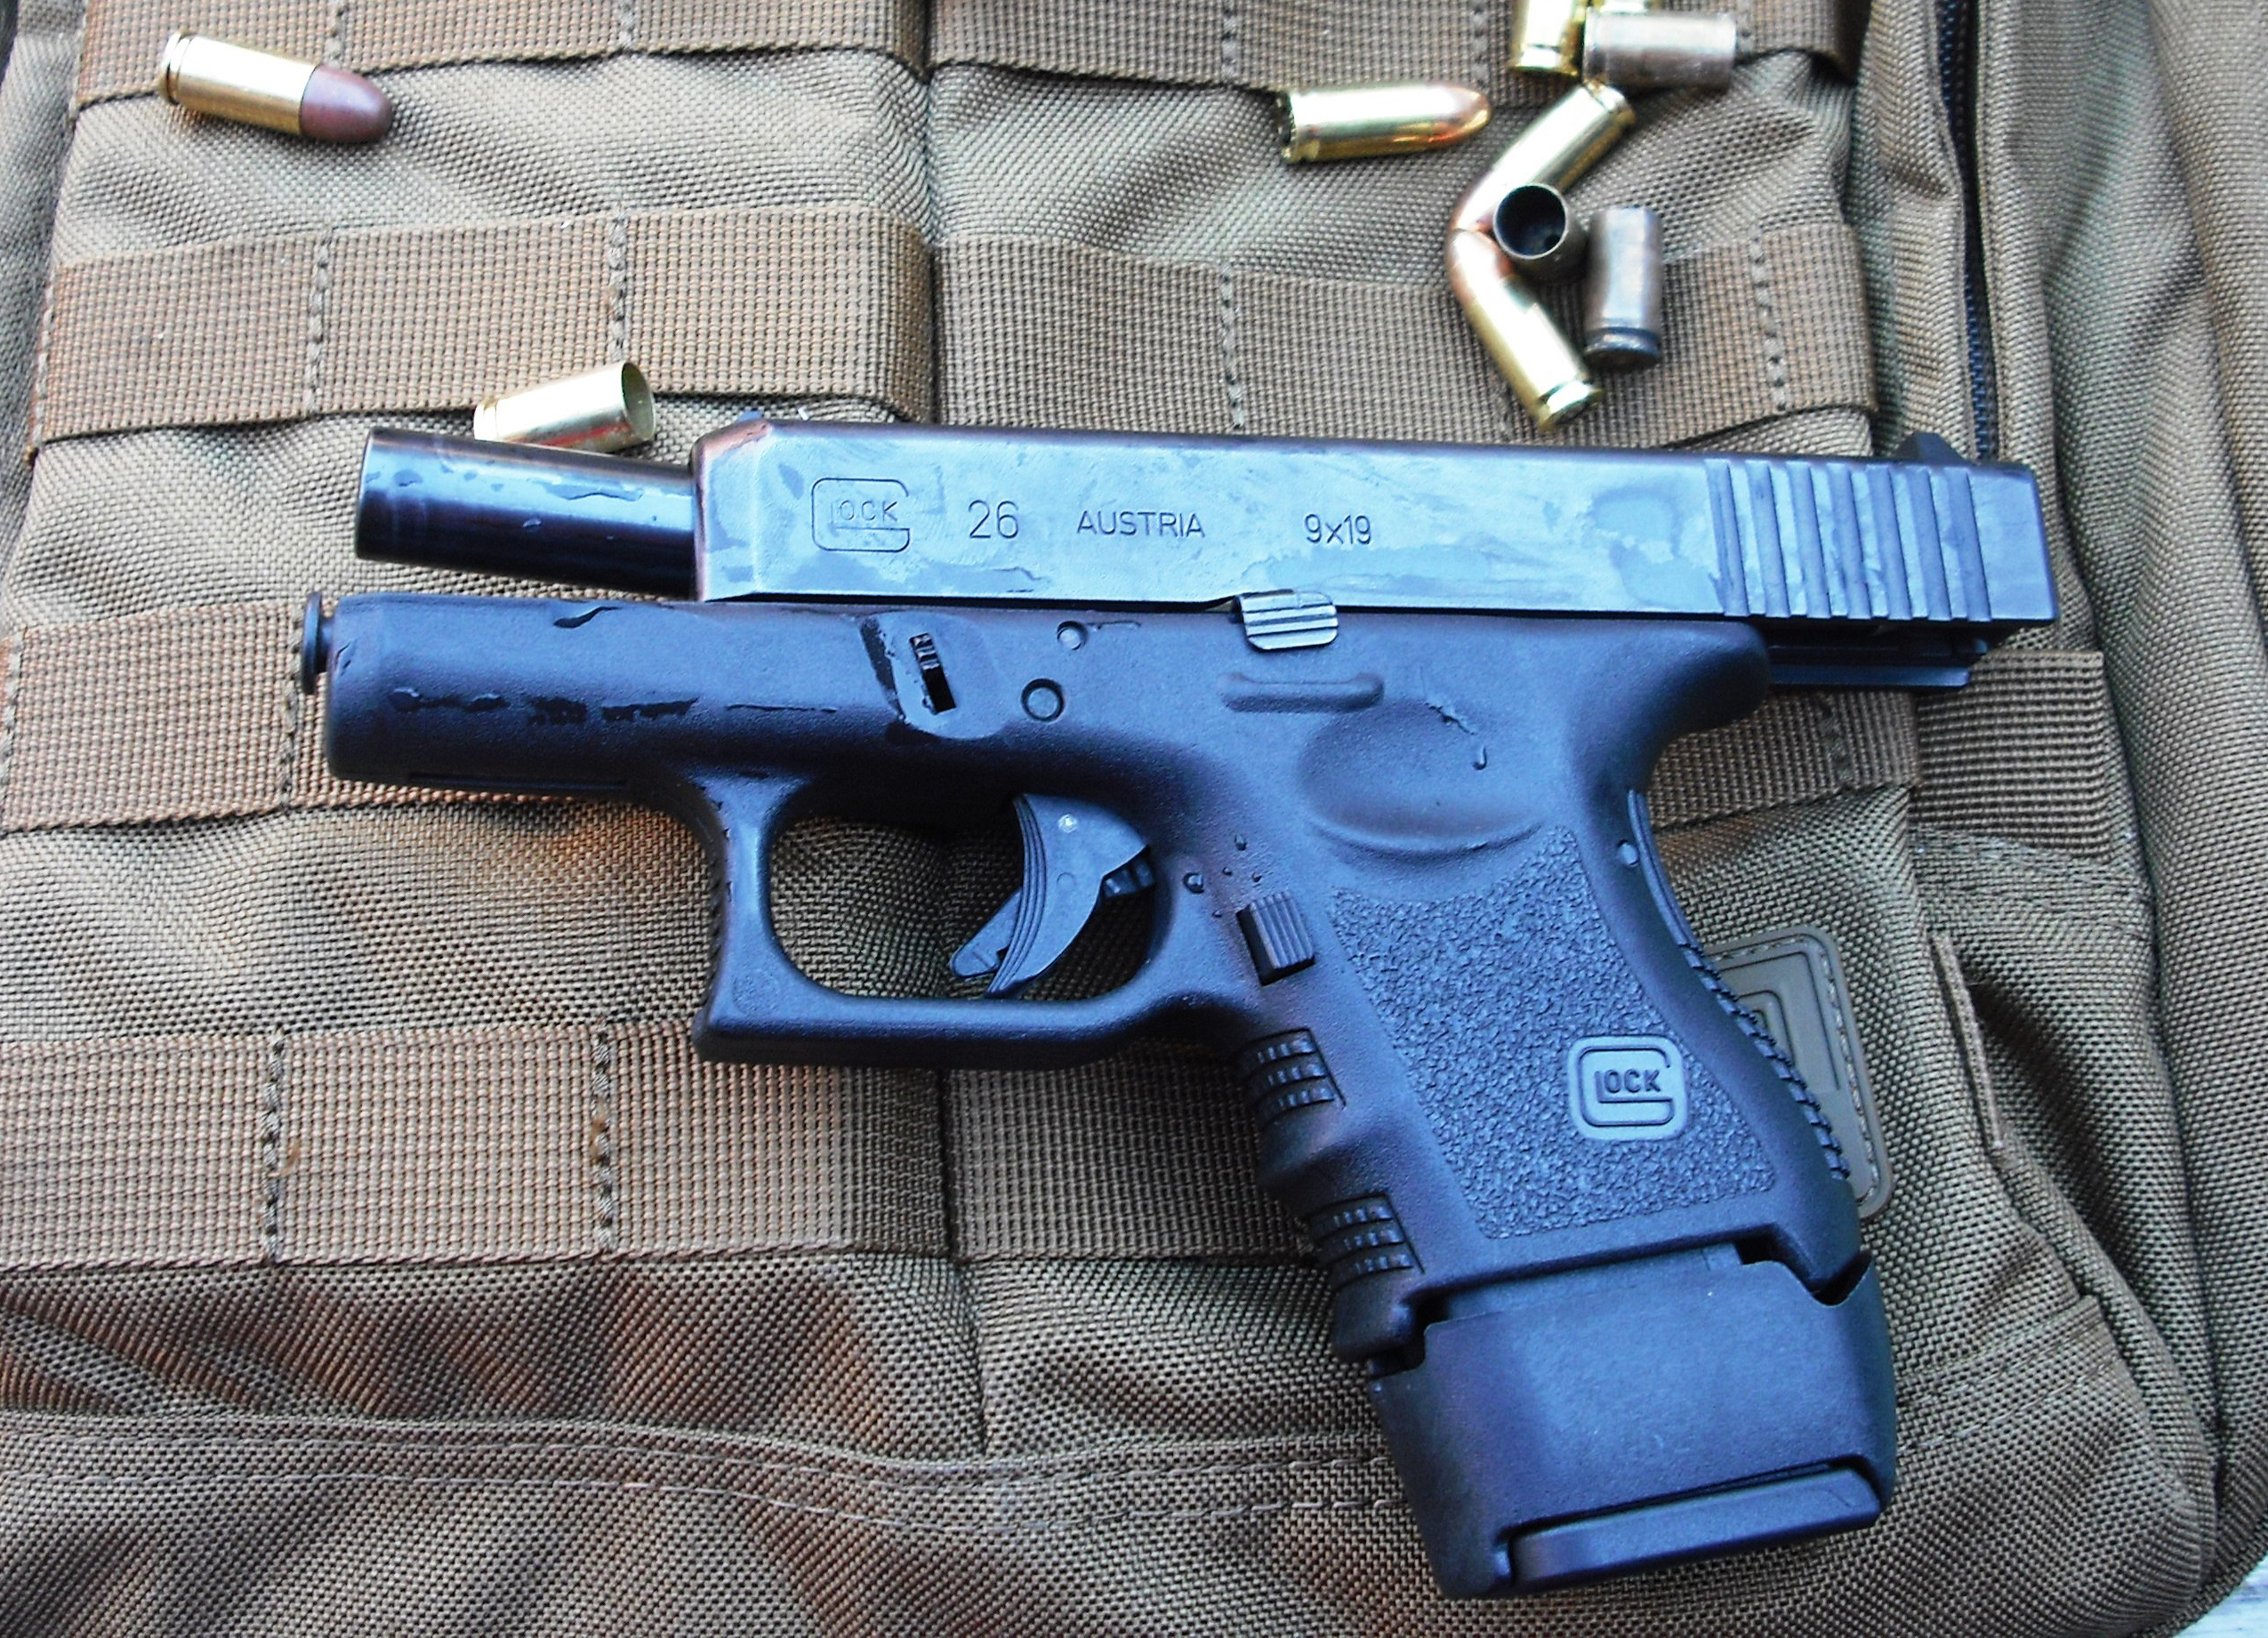 Glock 26 protagonista de la prueba